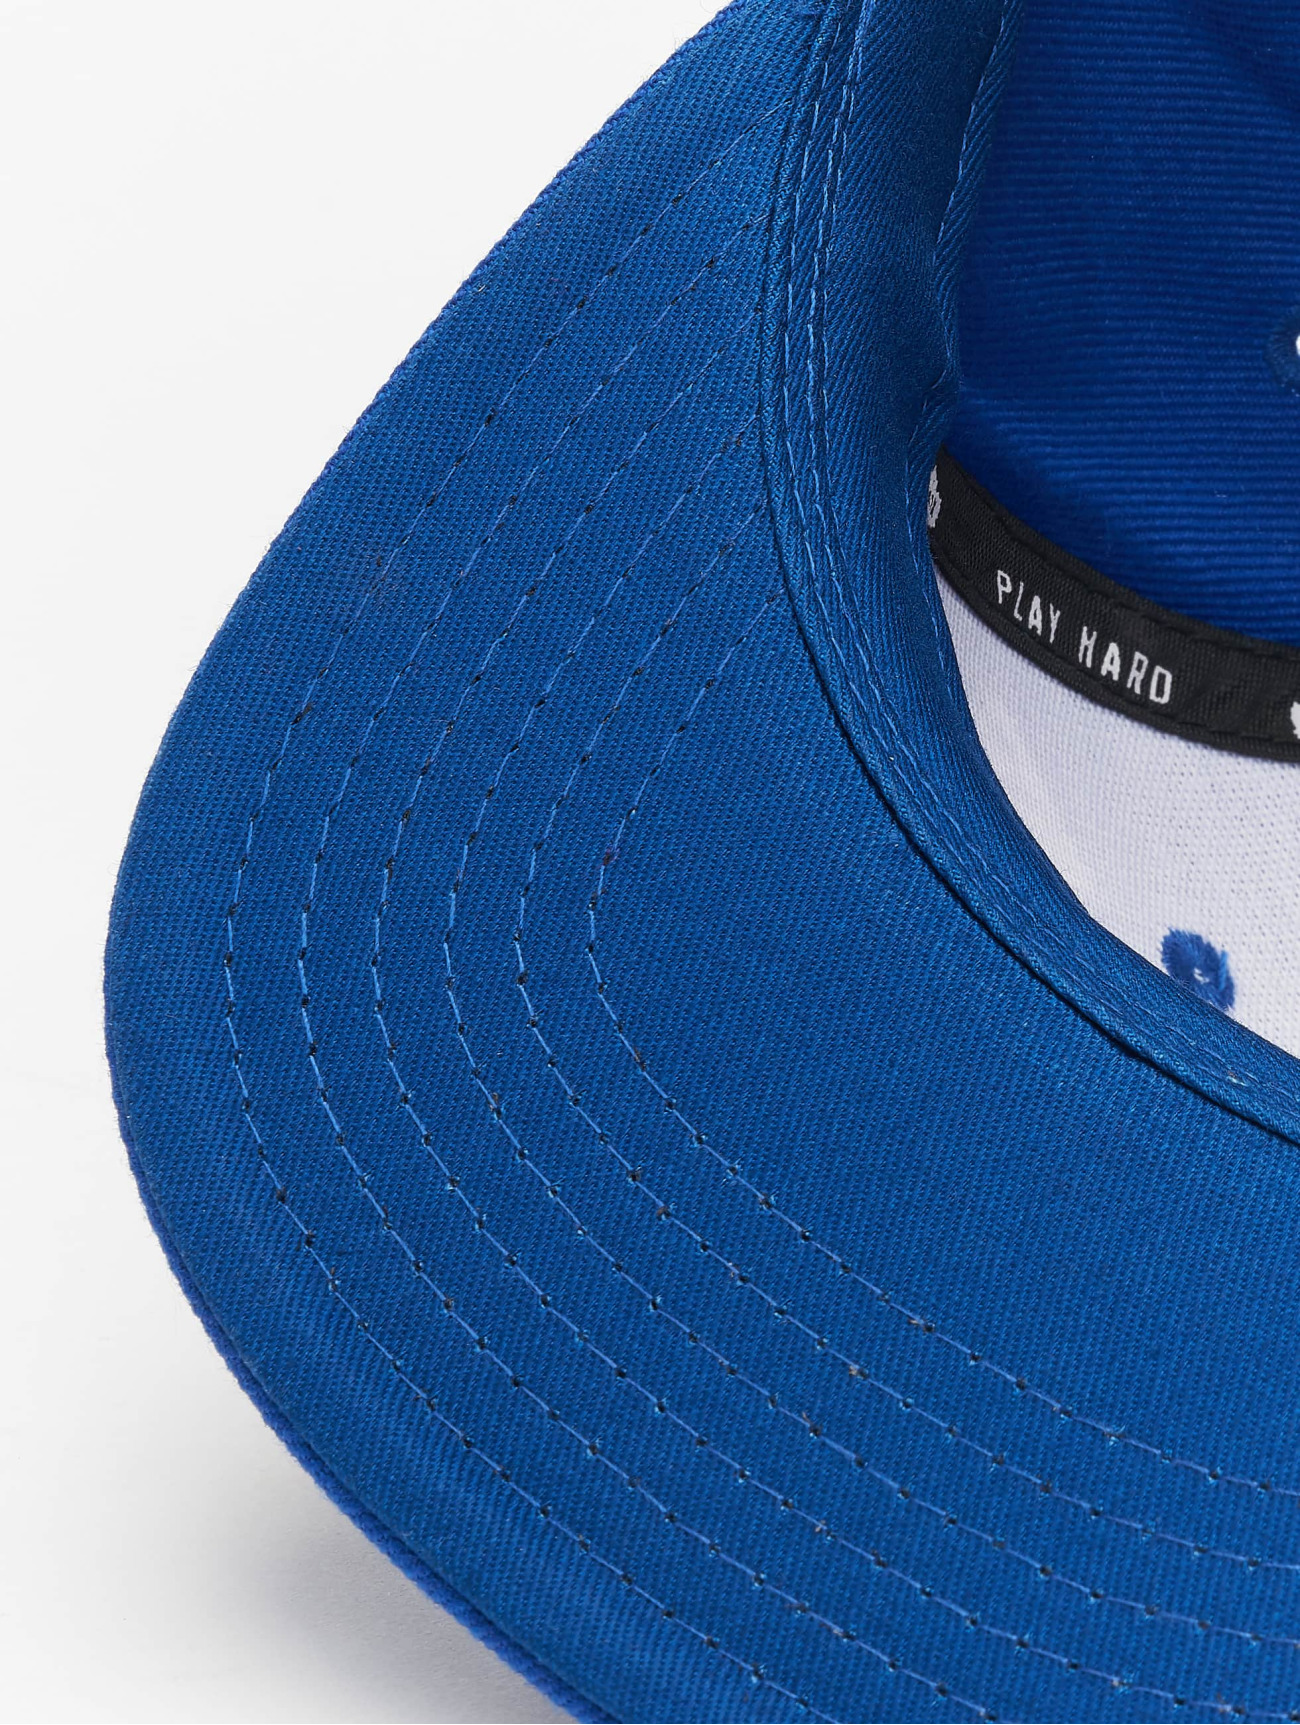 K1X  University of Basketball  bleu  Casquette Snapback & Strapback  429238 Homme Casquettes